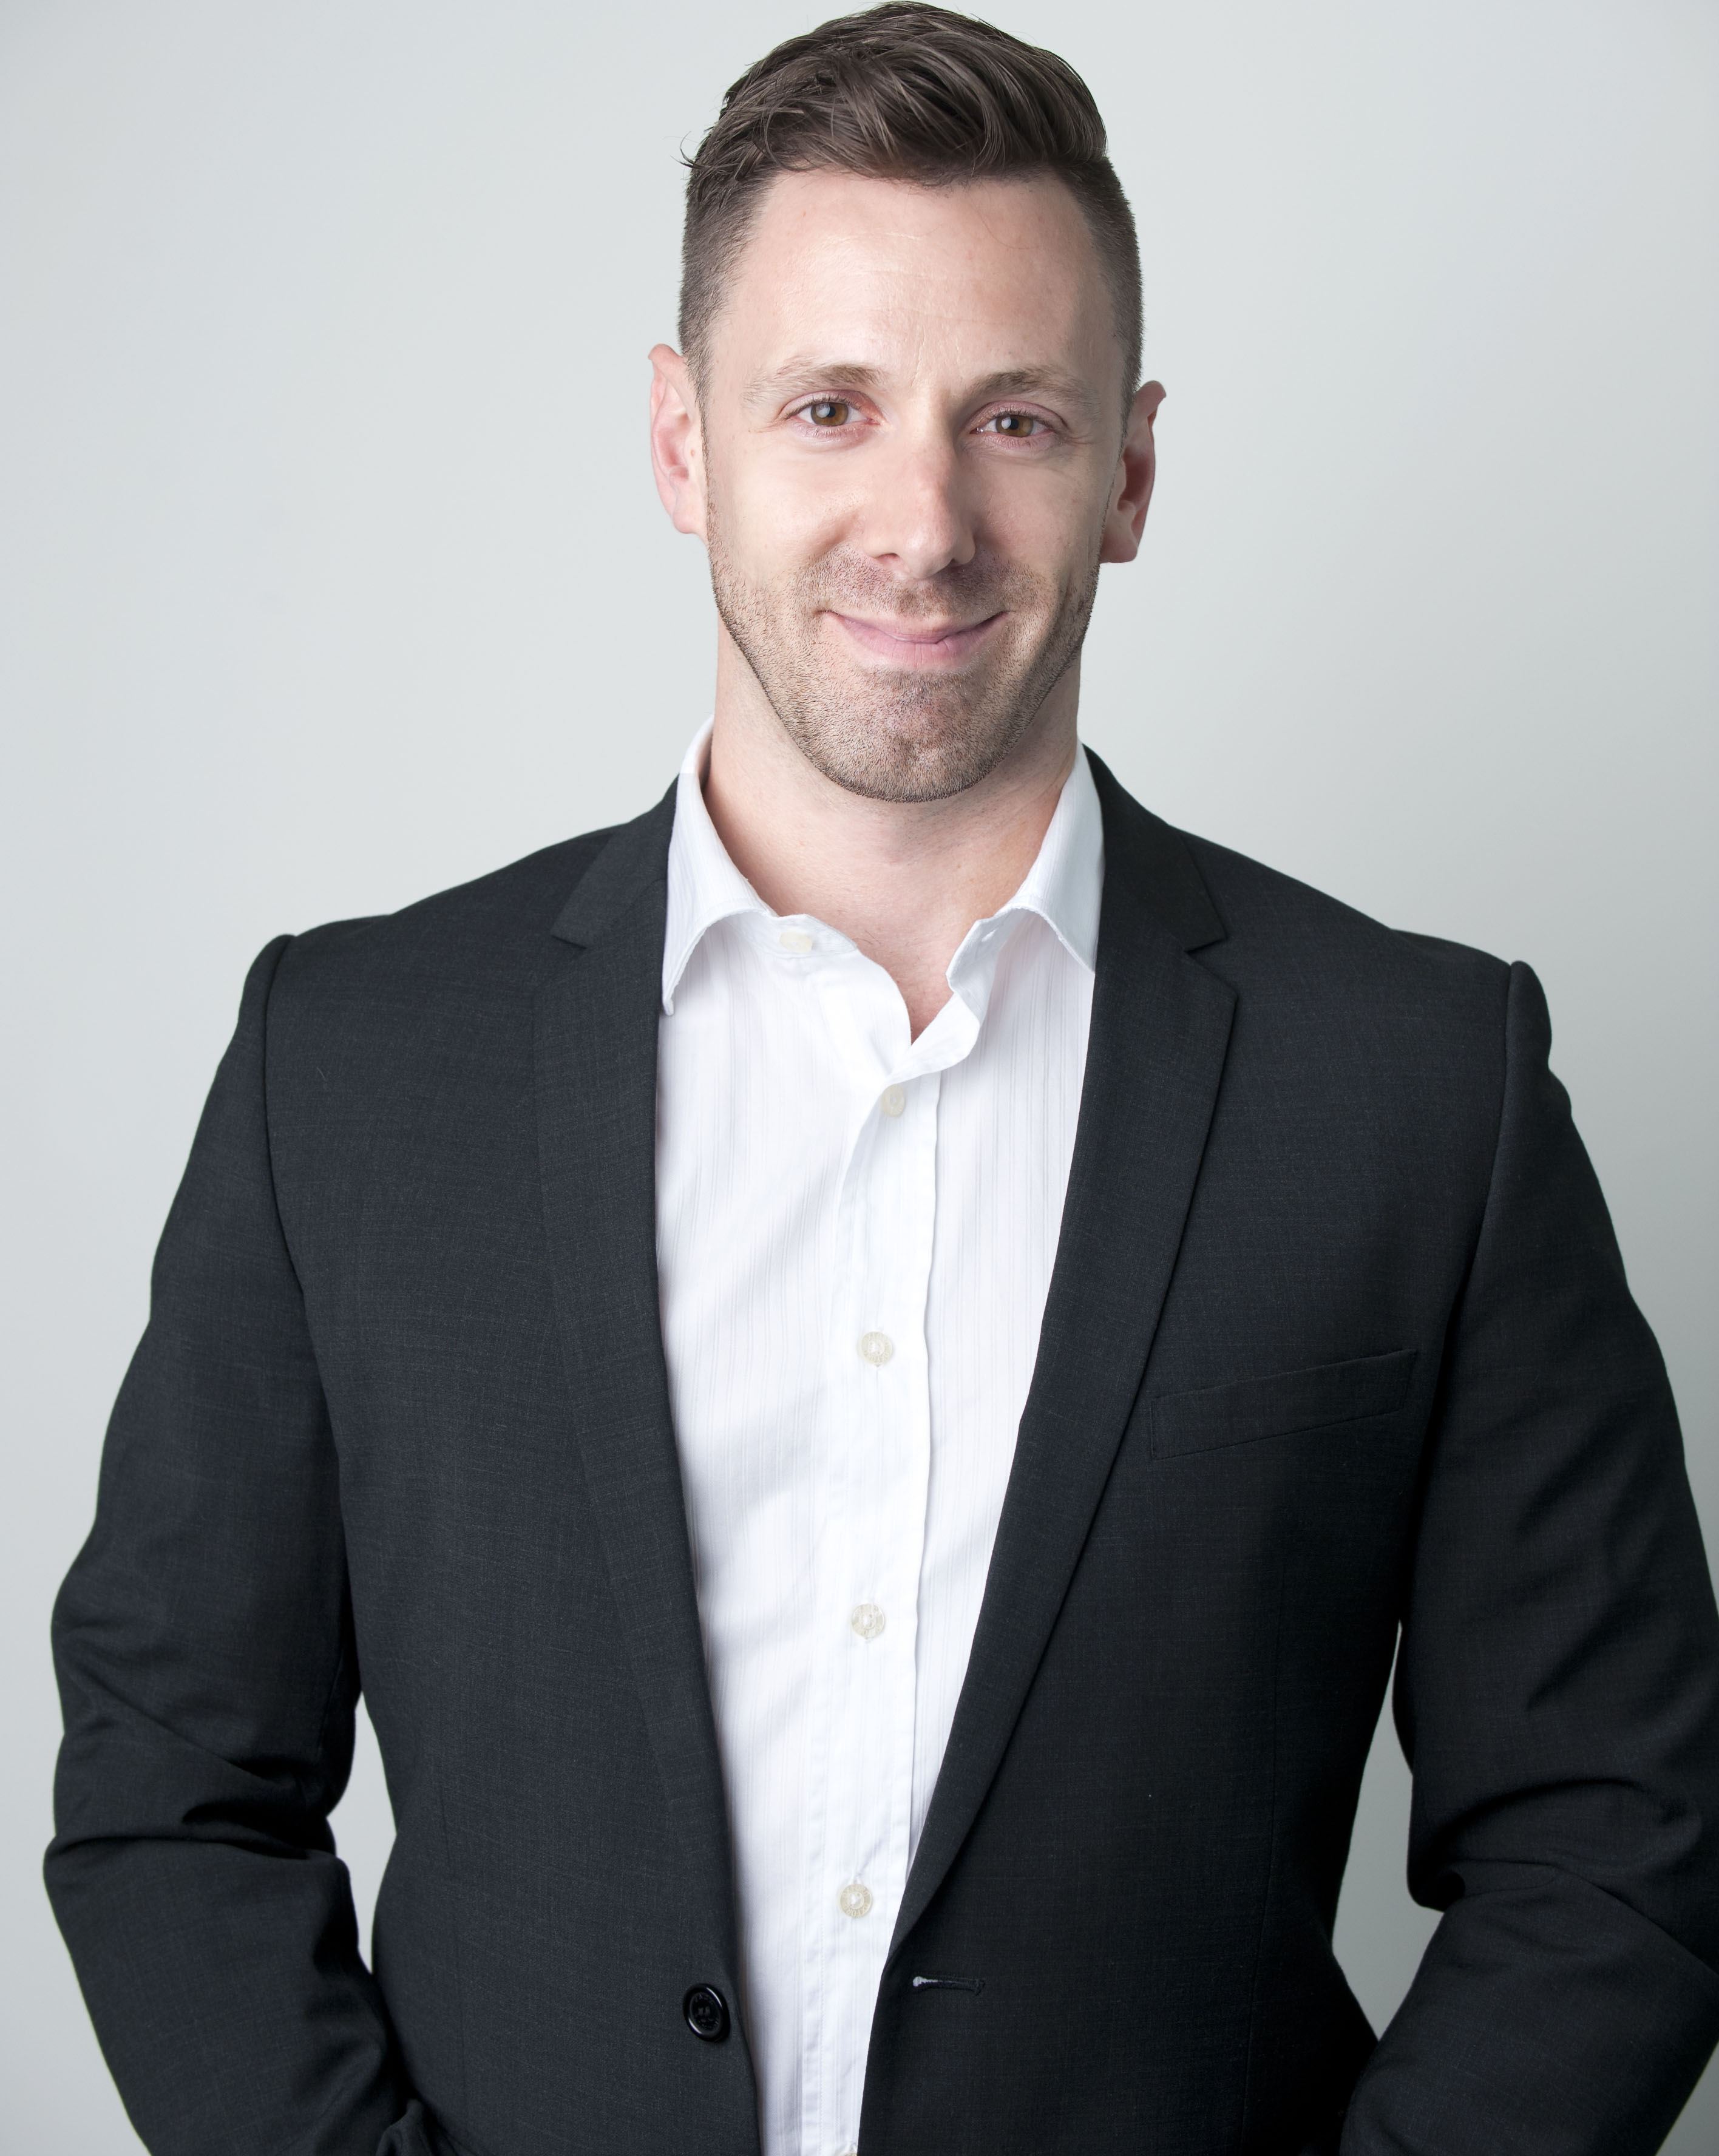 Andrew Brannaghan